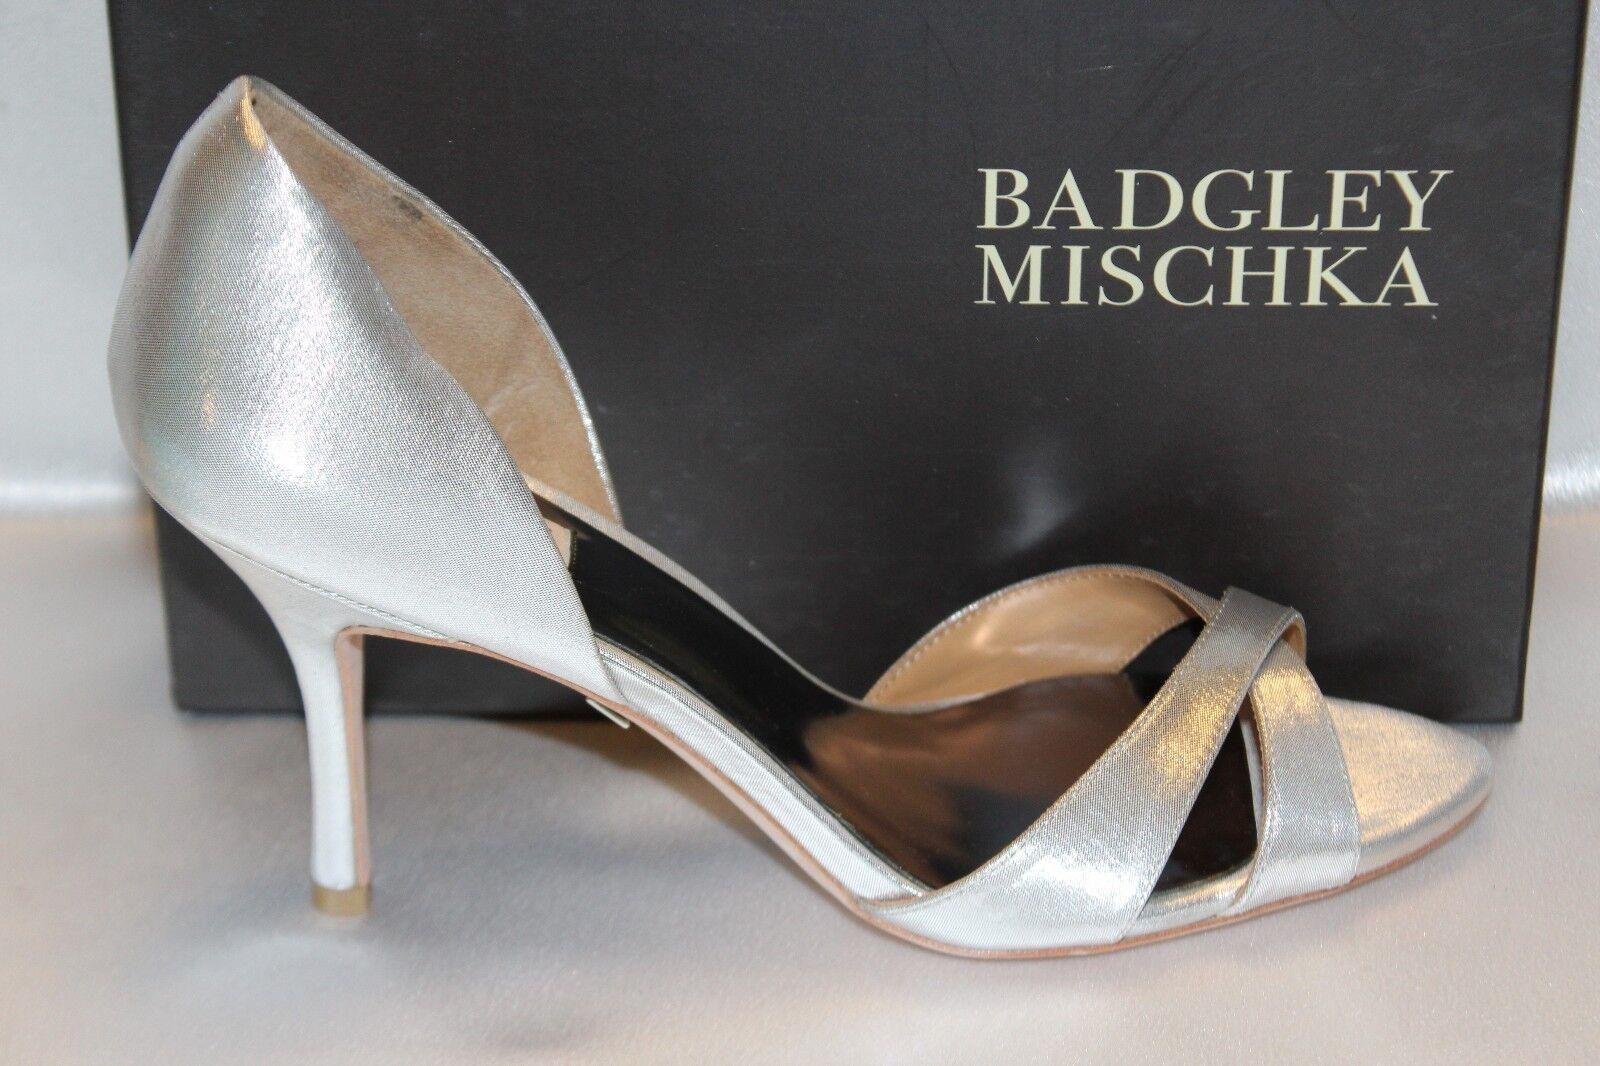 NEW  BADGLEY MISCHKA MISCHKA MISCHKA Silver MYSTERY Heels Open Toe Formal Bridal Schuhes 10 198 69f055